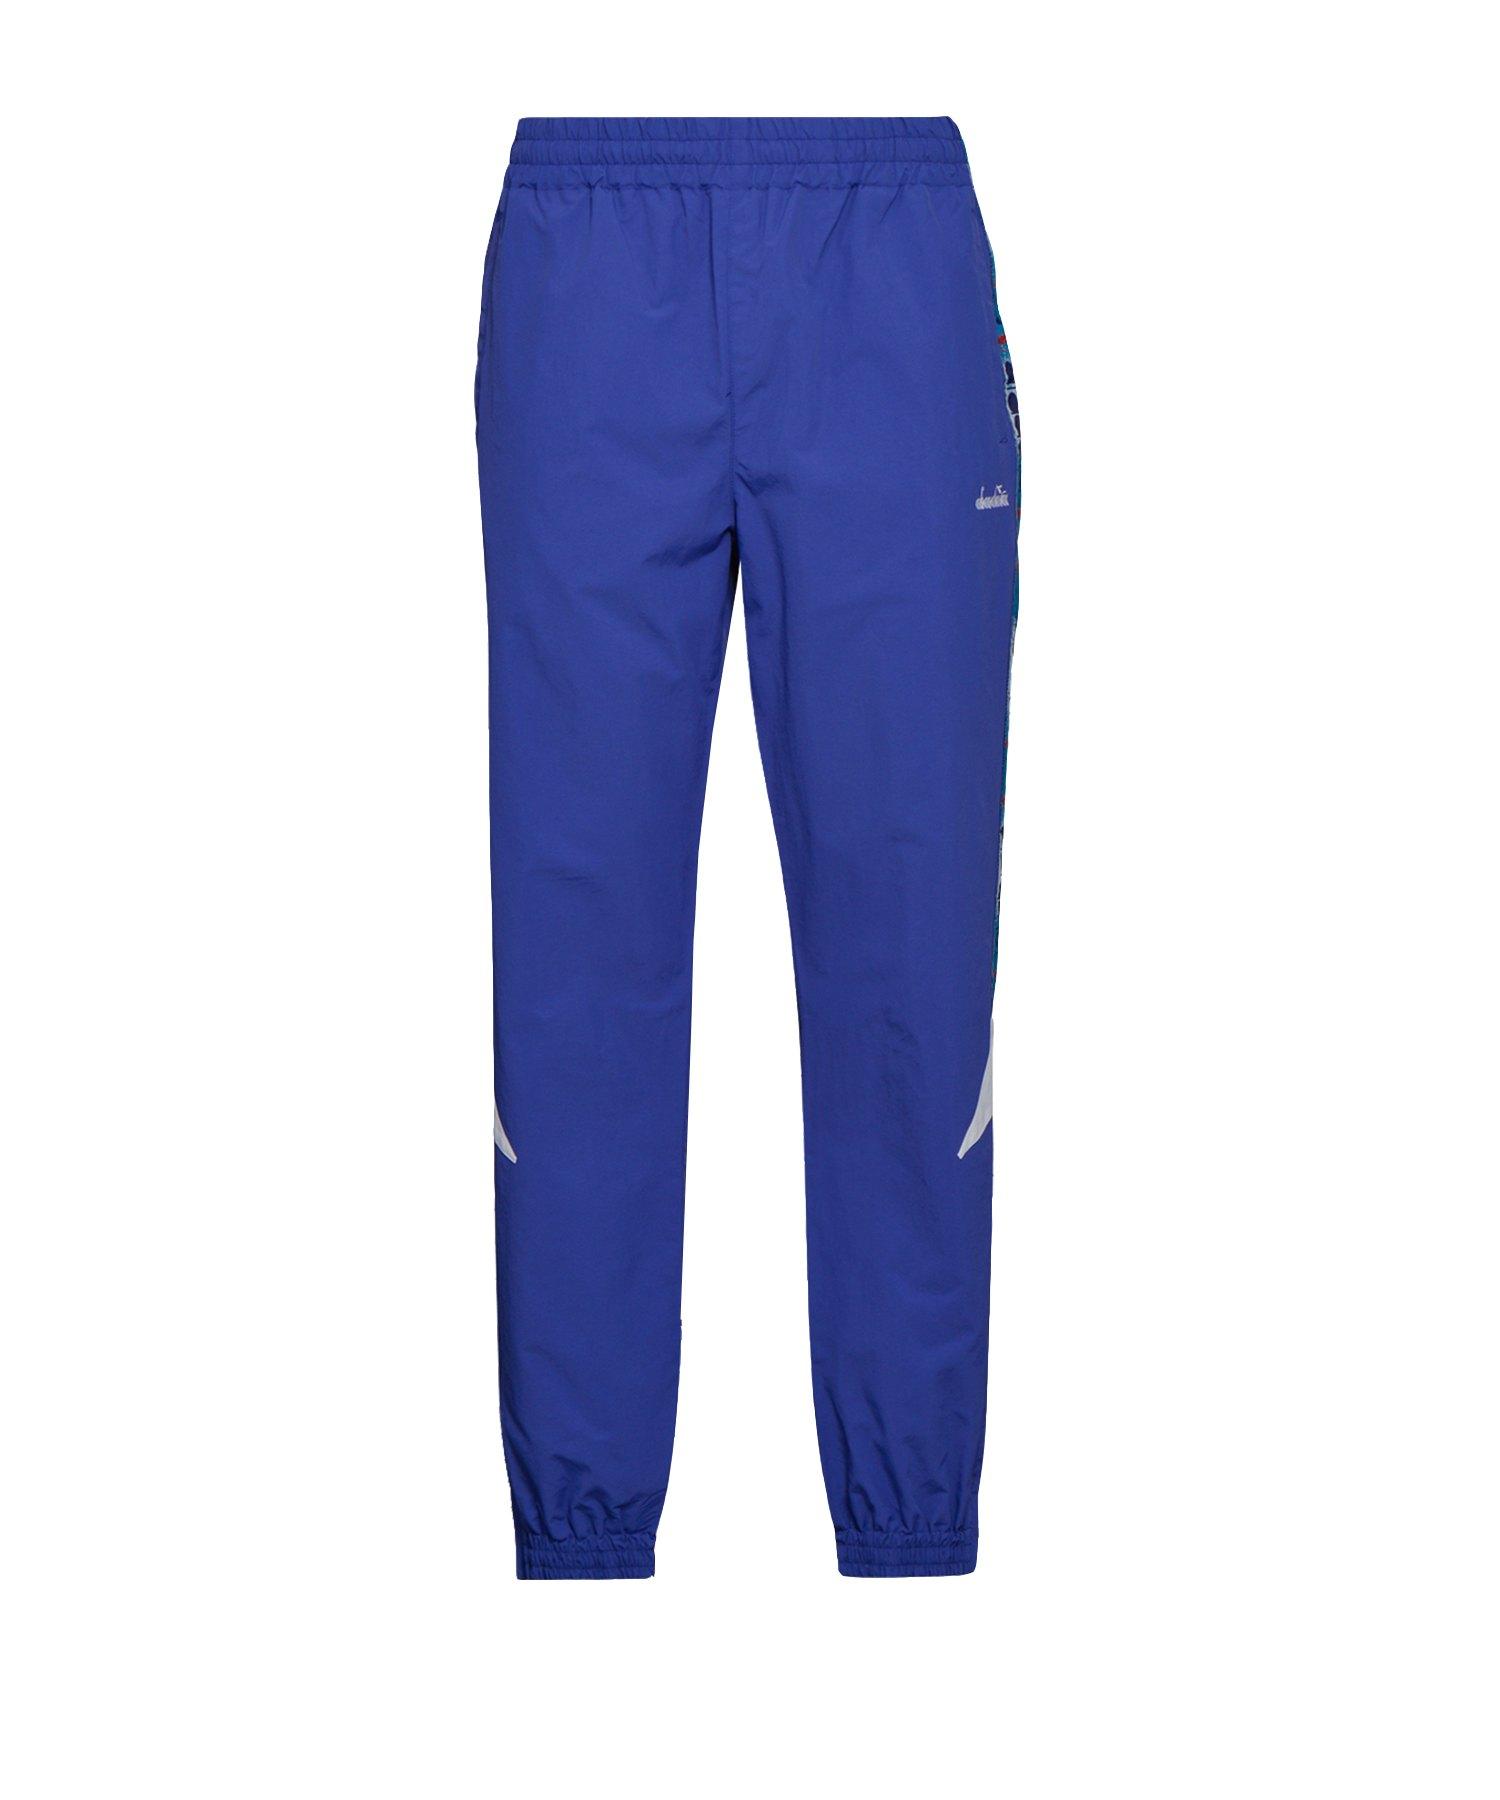 Diadora Pant MVB Hose lang Blau F60049 - blau